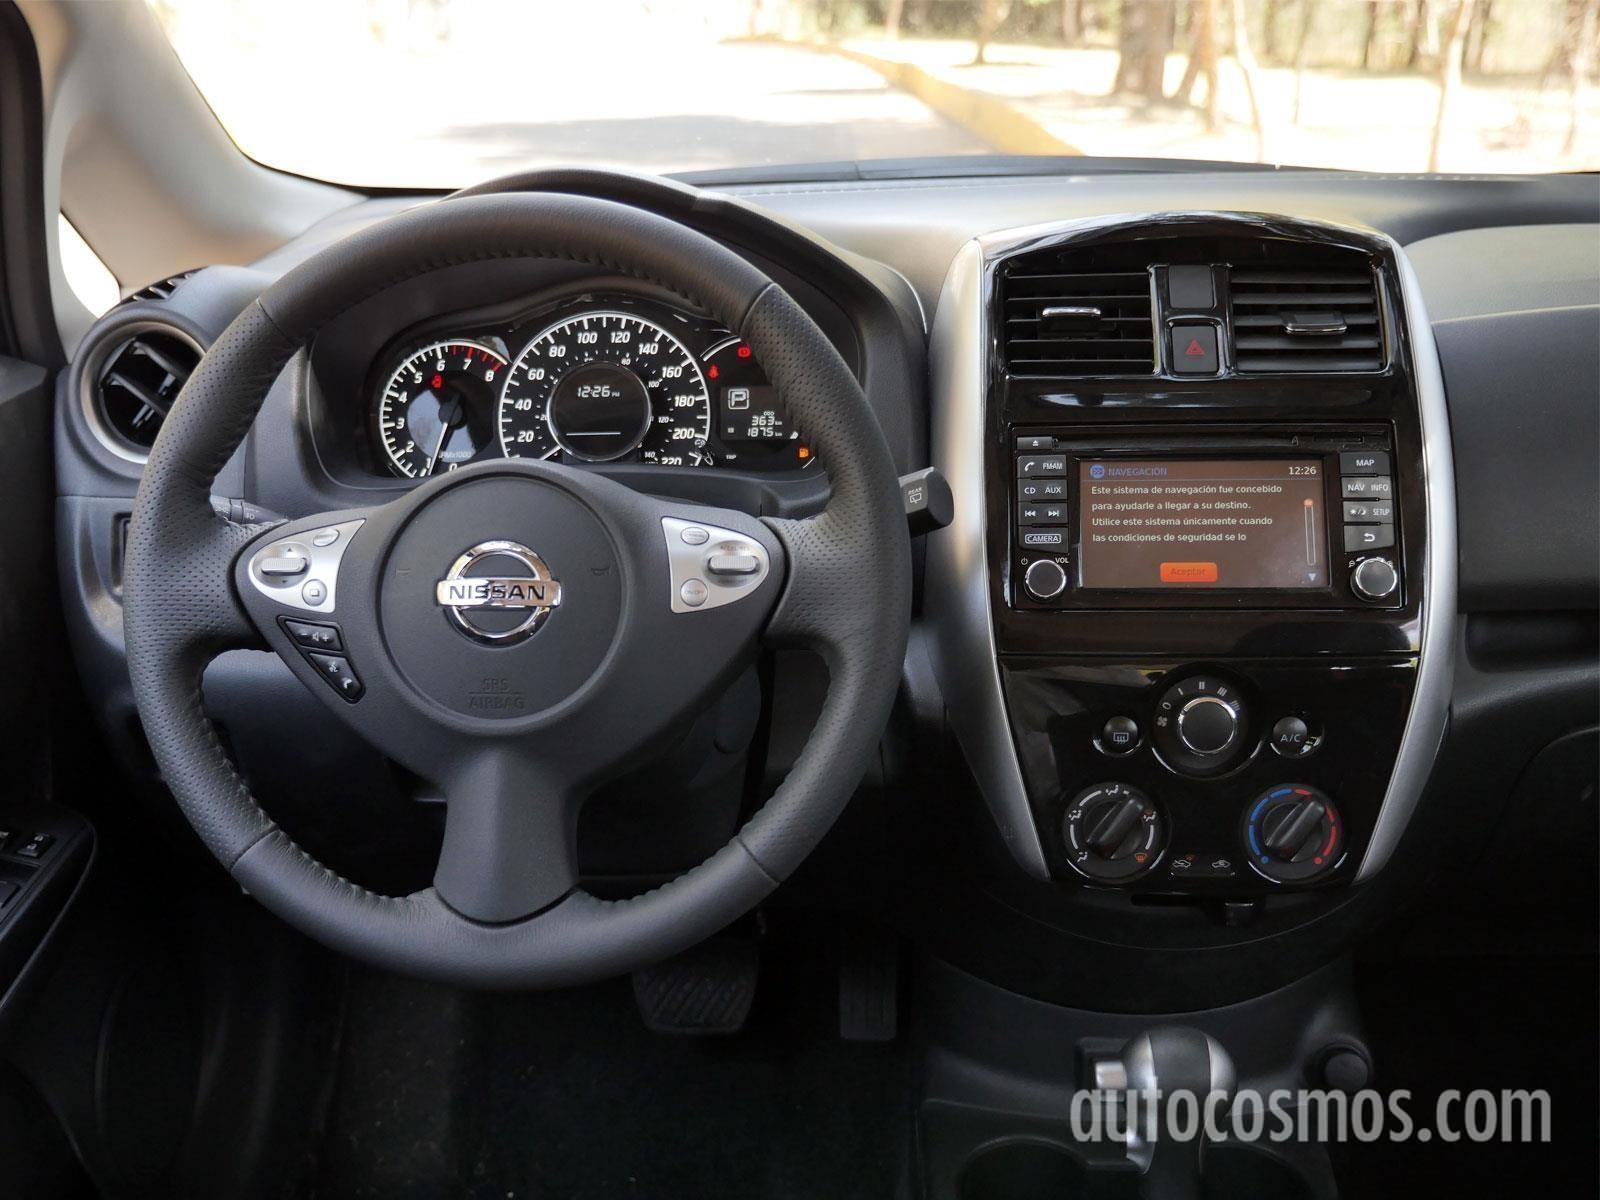 Nissan Note 2017 A Prueba Autocosmos Com